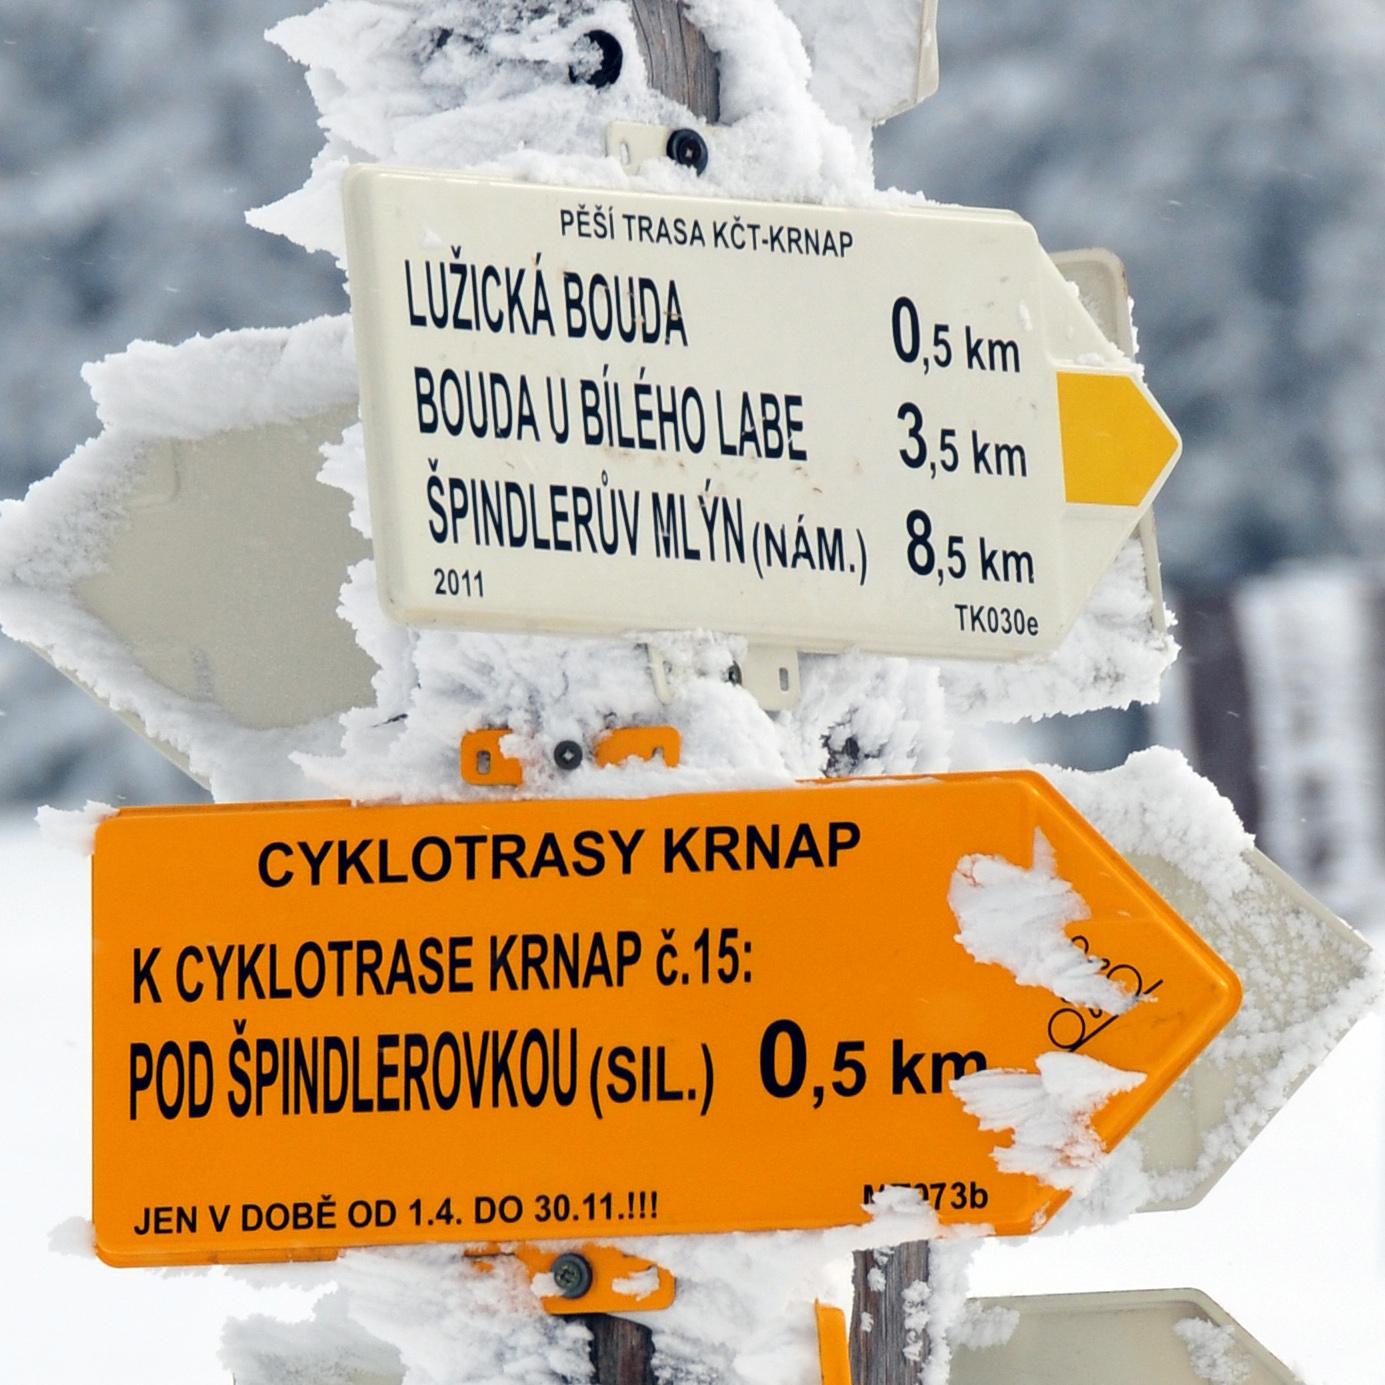 13-04-01-spindlerova-bouda-by-RalfR-009a.jpg